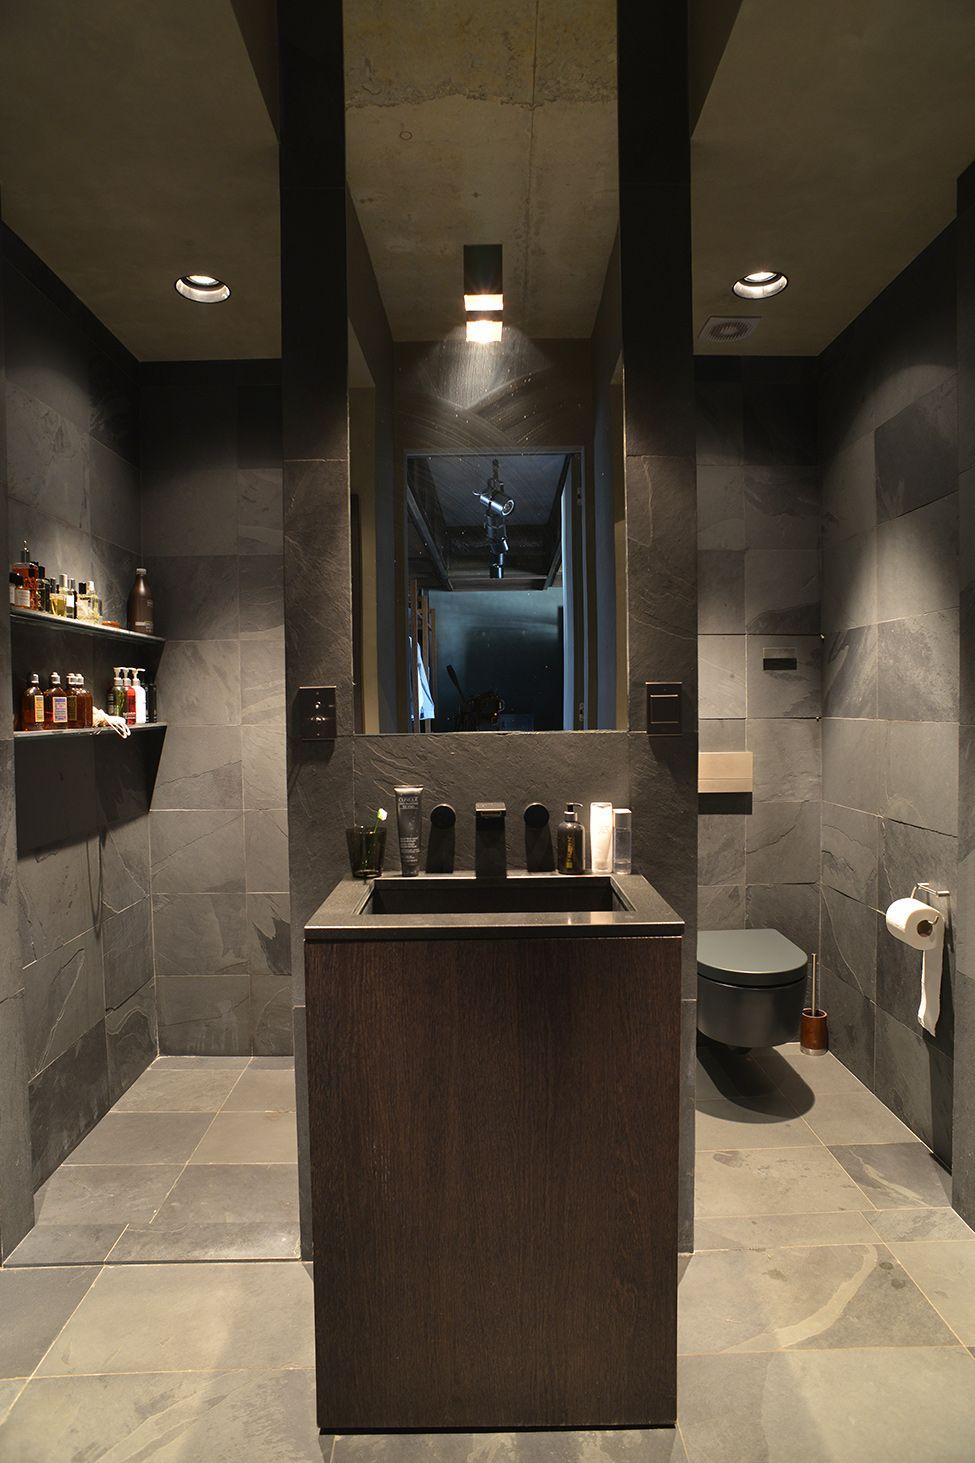 Masculine bathroom spaces and interiors - Elegant minimalist loft design in masculine vibe wooden decoration ...